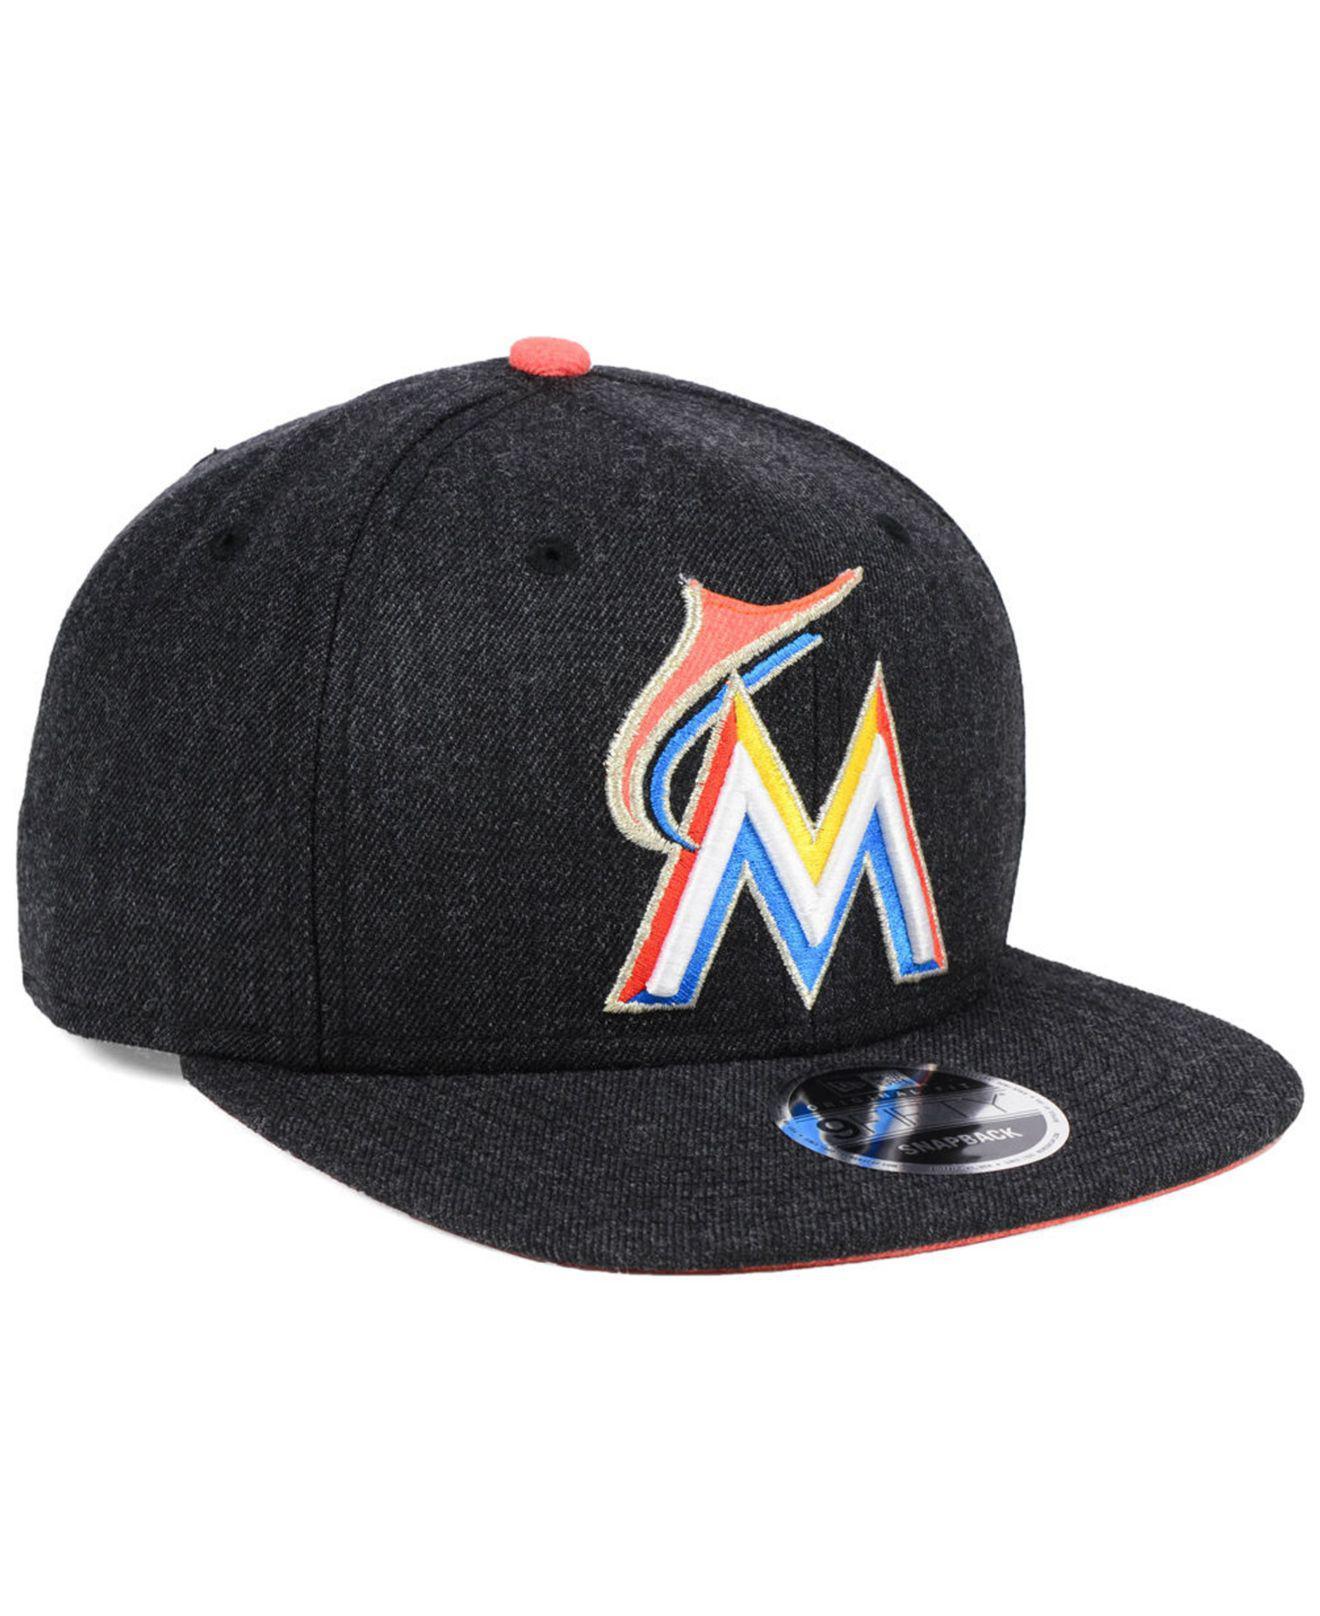 e0522ef7d4bb9 ... new zealand miami marlins heather hype 9fifty snapback cap for men lyst.  view fullscreen 46a24